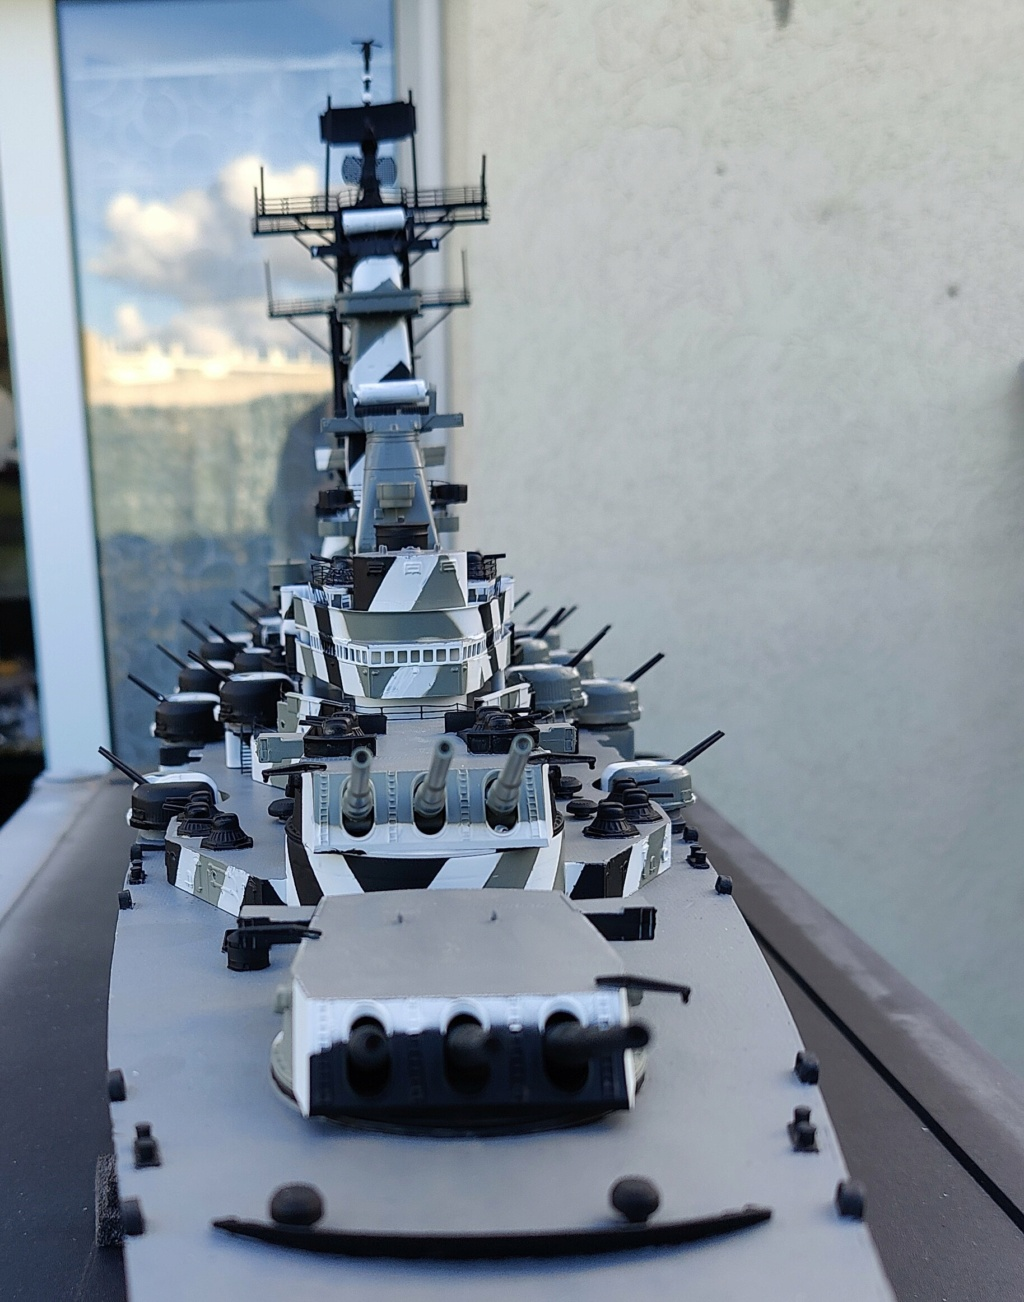 [Uchronie] USS Lake Michigan (base Iowa Trumpeter 1/200°) par hibikitokay - Page 7 Img_2118